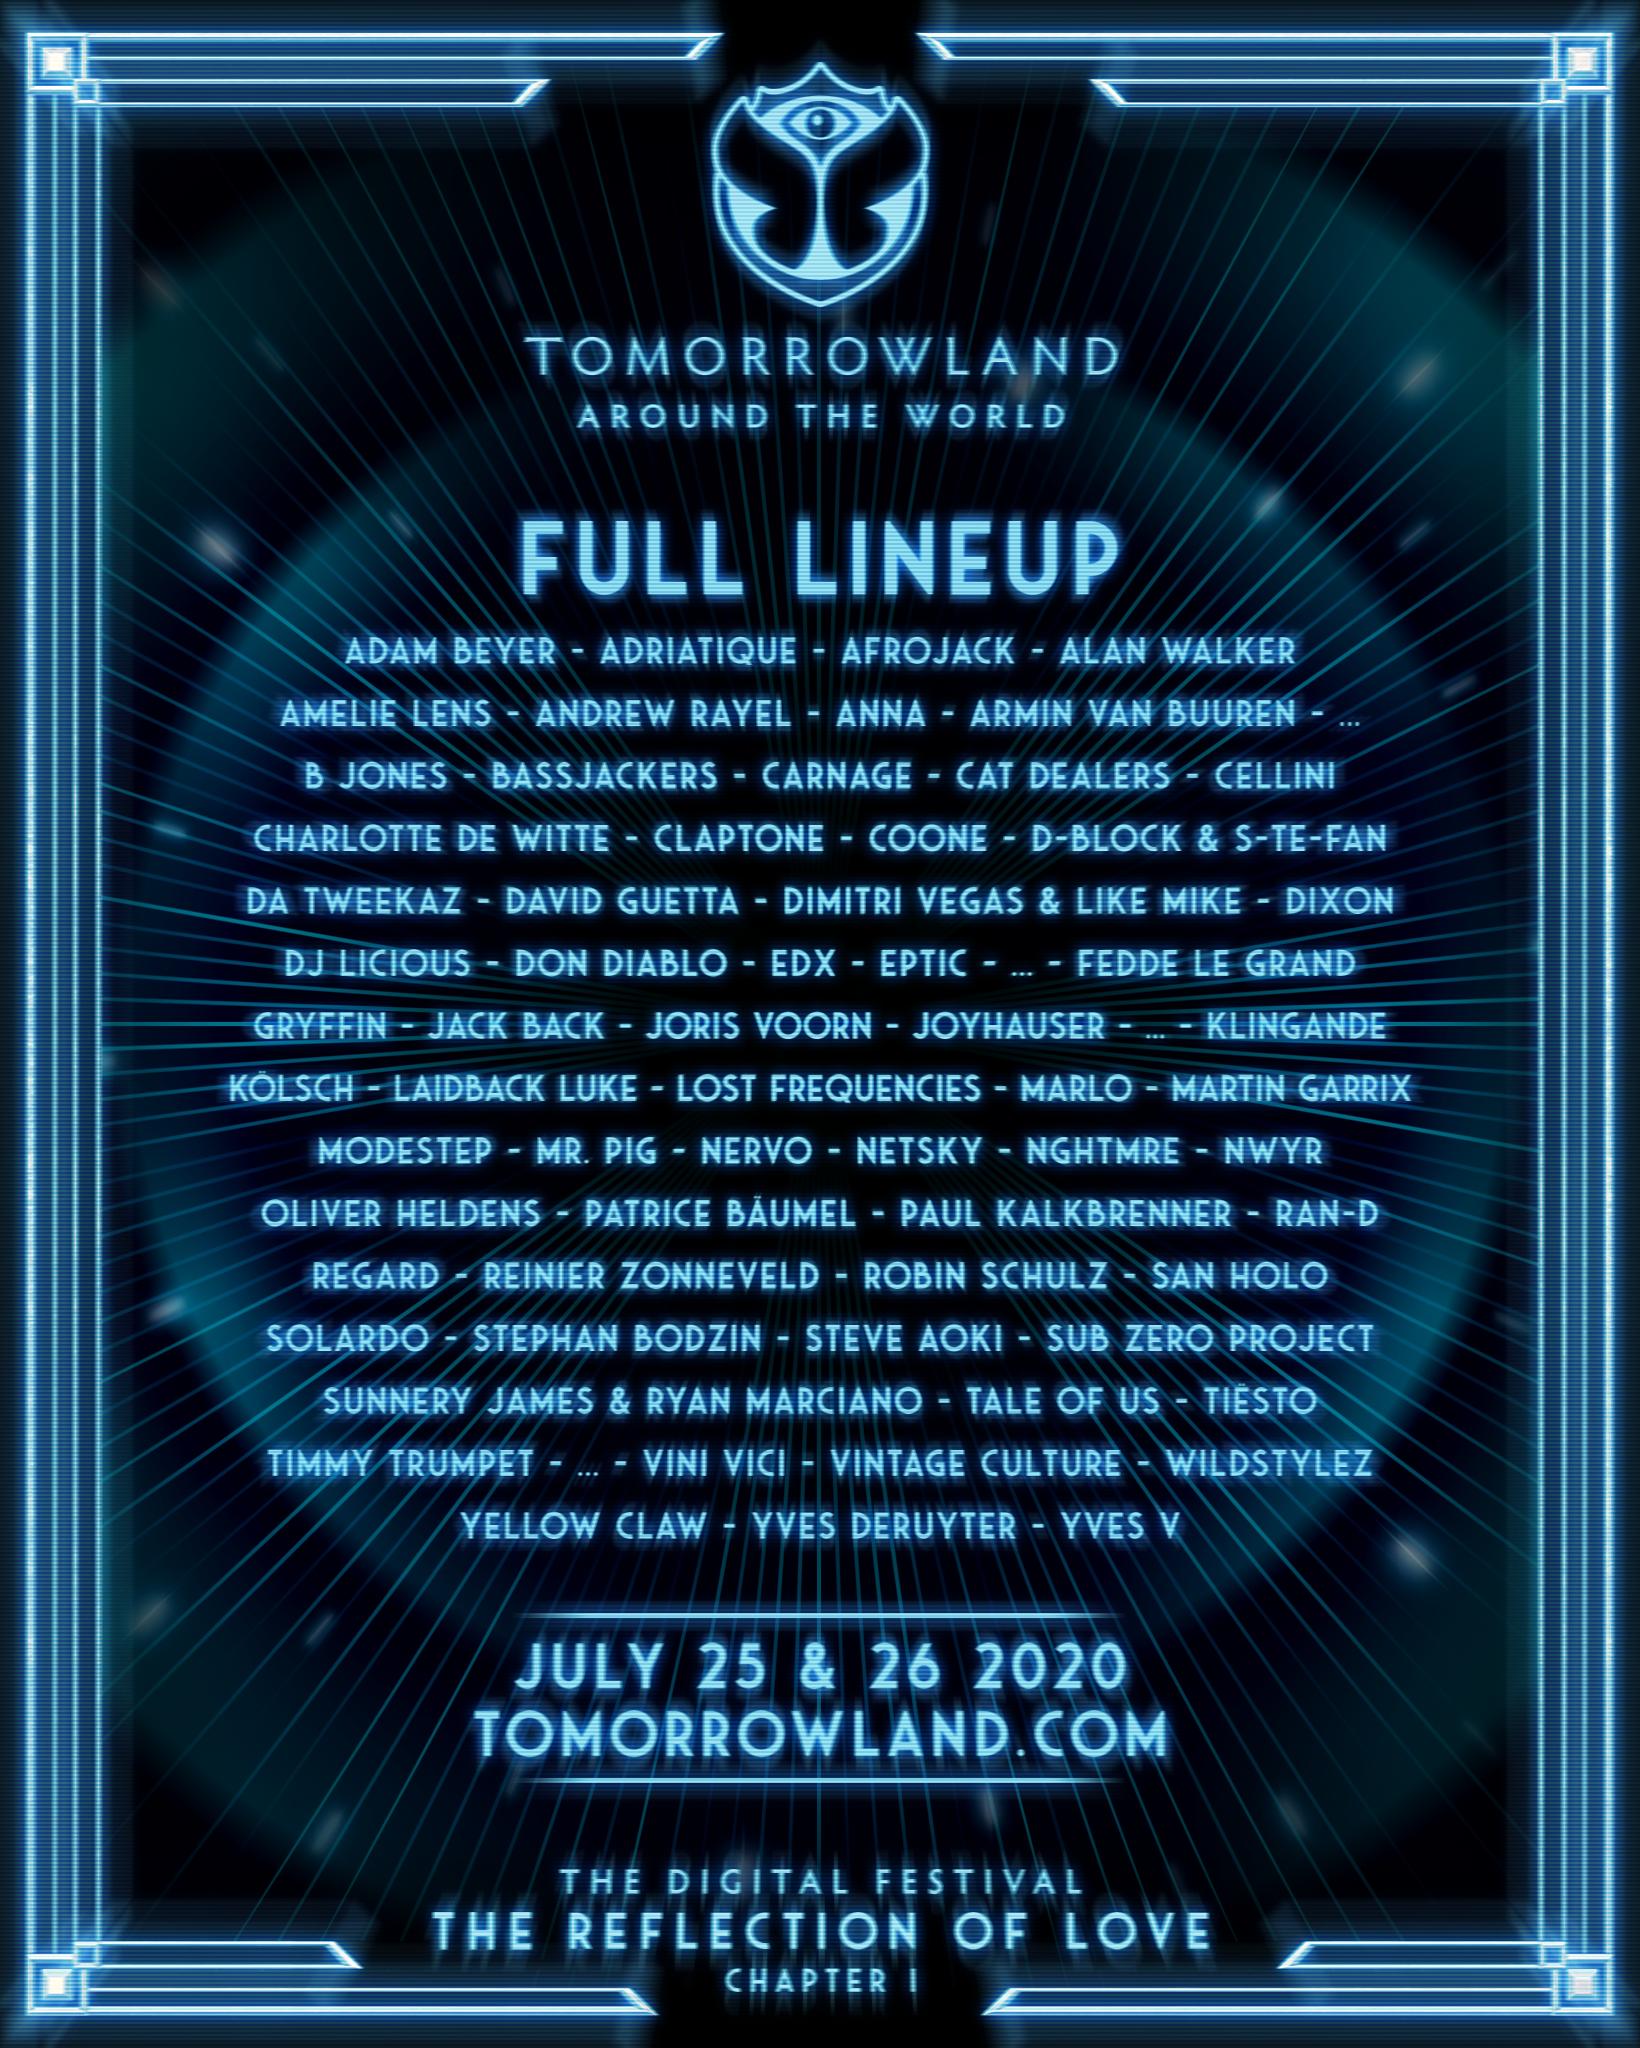 Tomorrowland Around the World, the digital festival, unveils star-studded line-up with Adam Beyer, Amelie Lens, Armin van Buuren, Charlotte de Witte, David Guetta, Dimitri Vegas & Like Mike, Kolsch, etc.